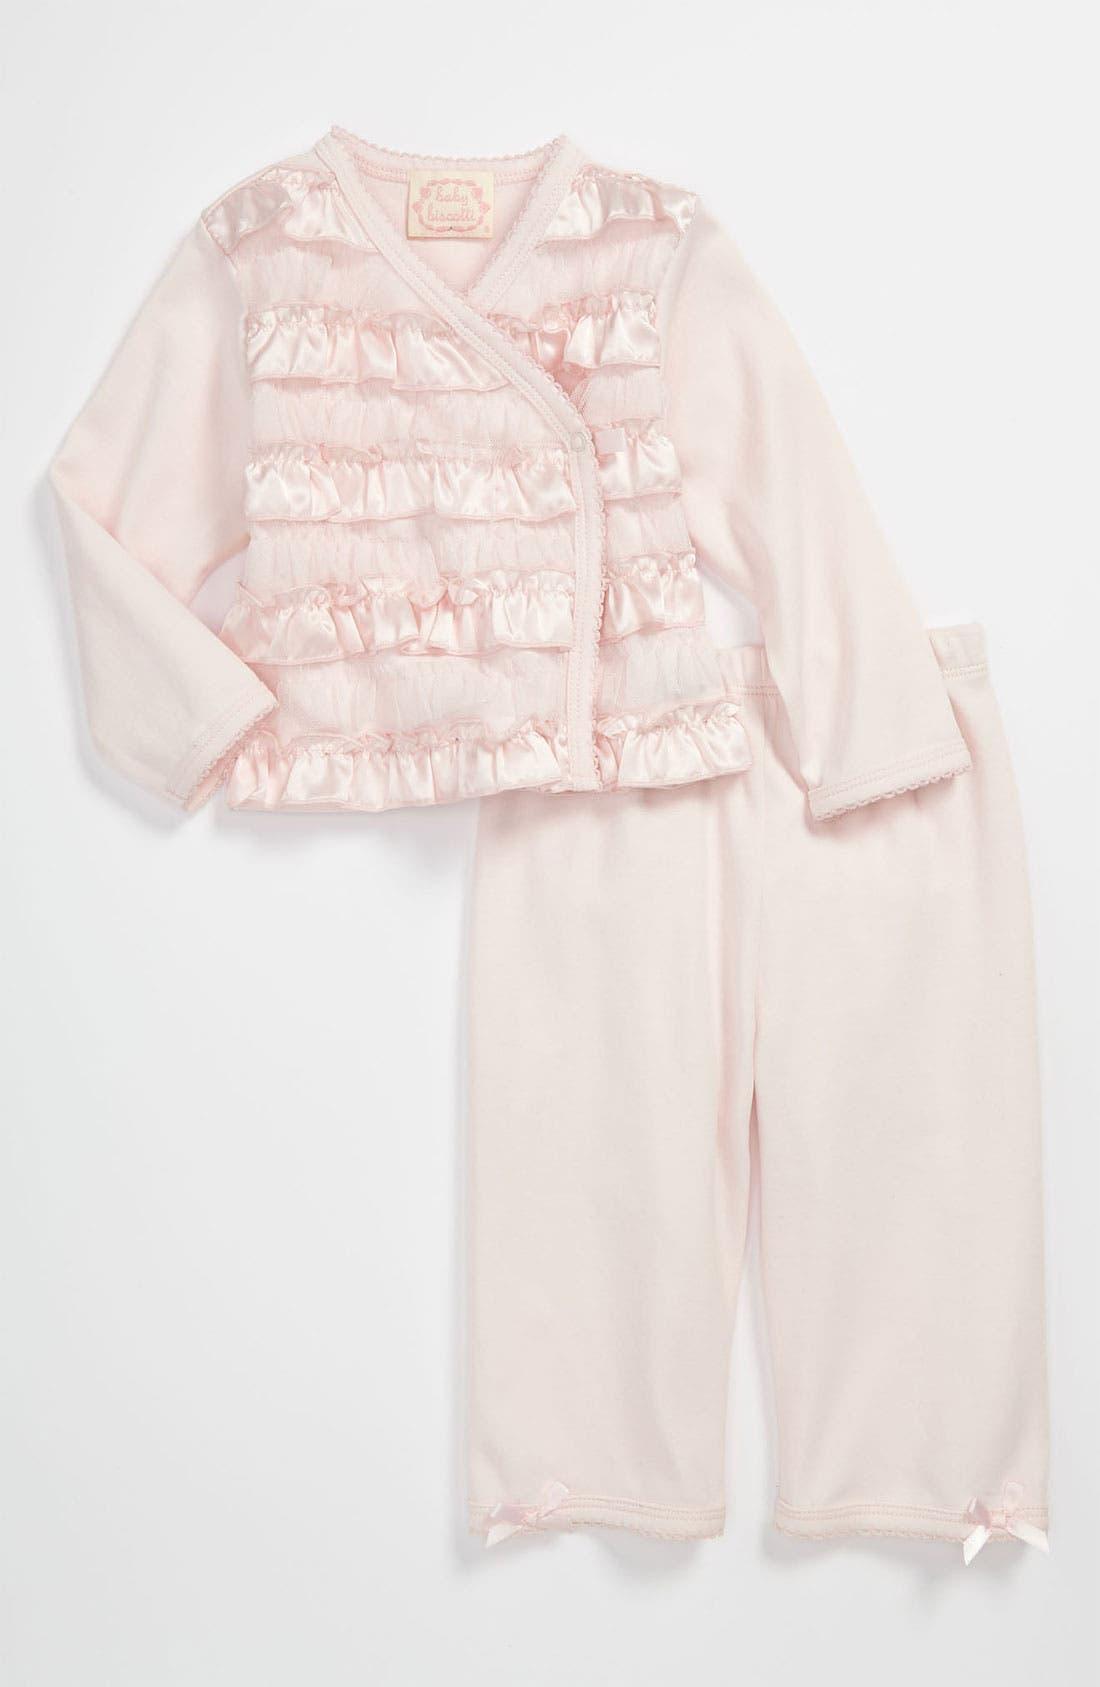 Main Image - Biscotti Ruffle Top & Pants (Baby)